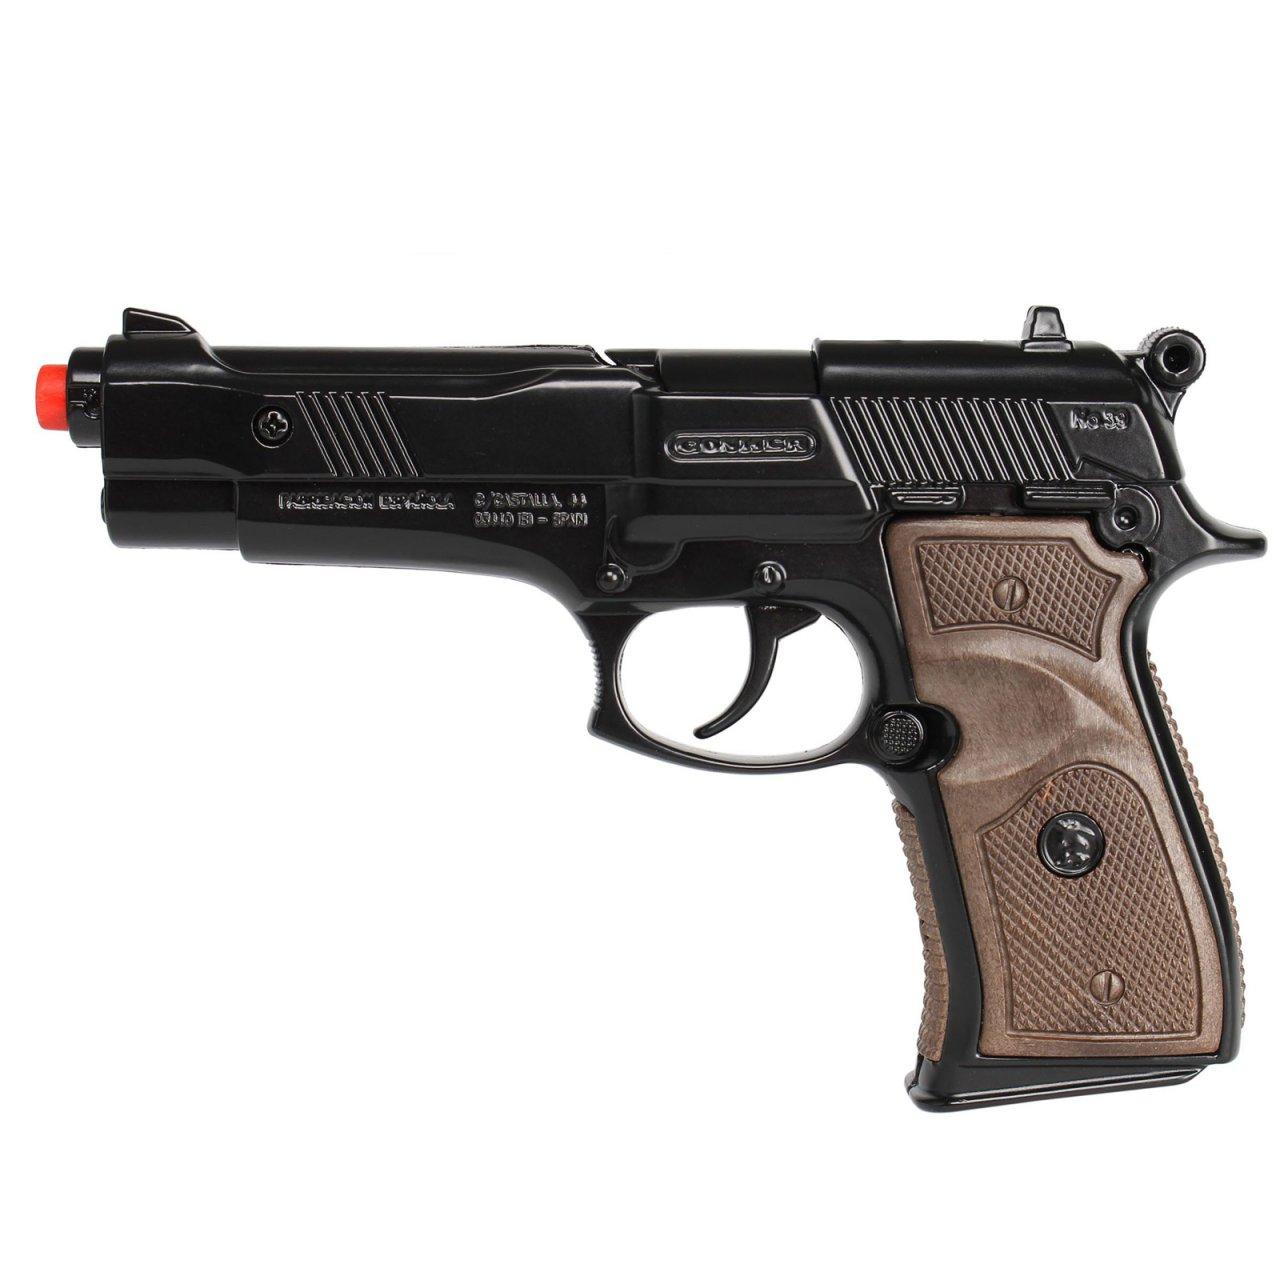 تفنگ بازی گانهر مدل پلیس کد 396